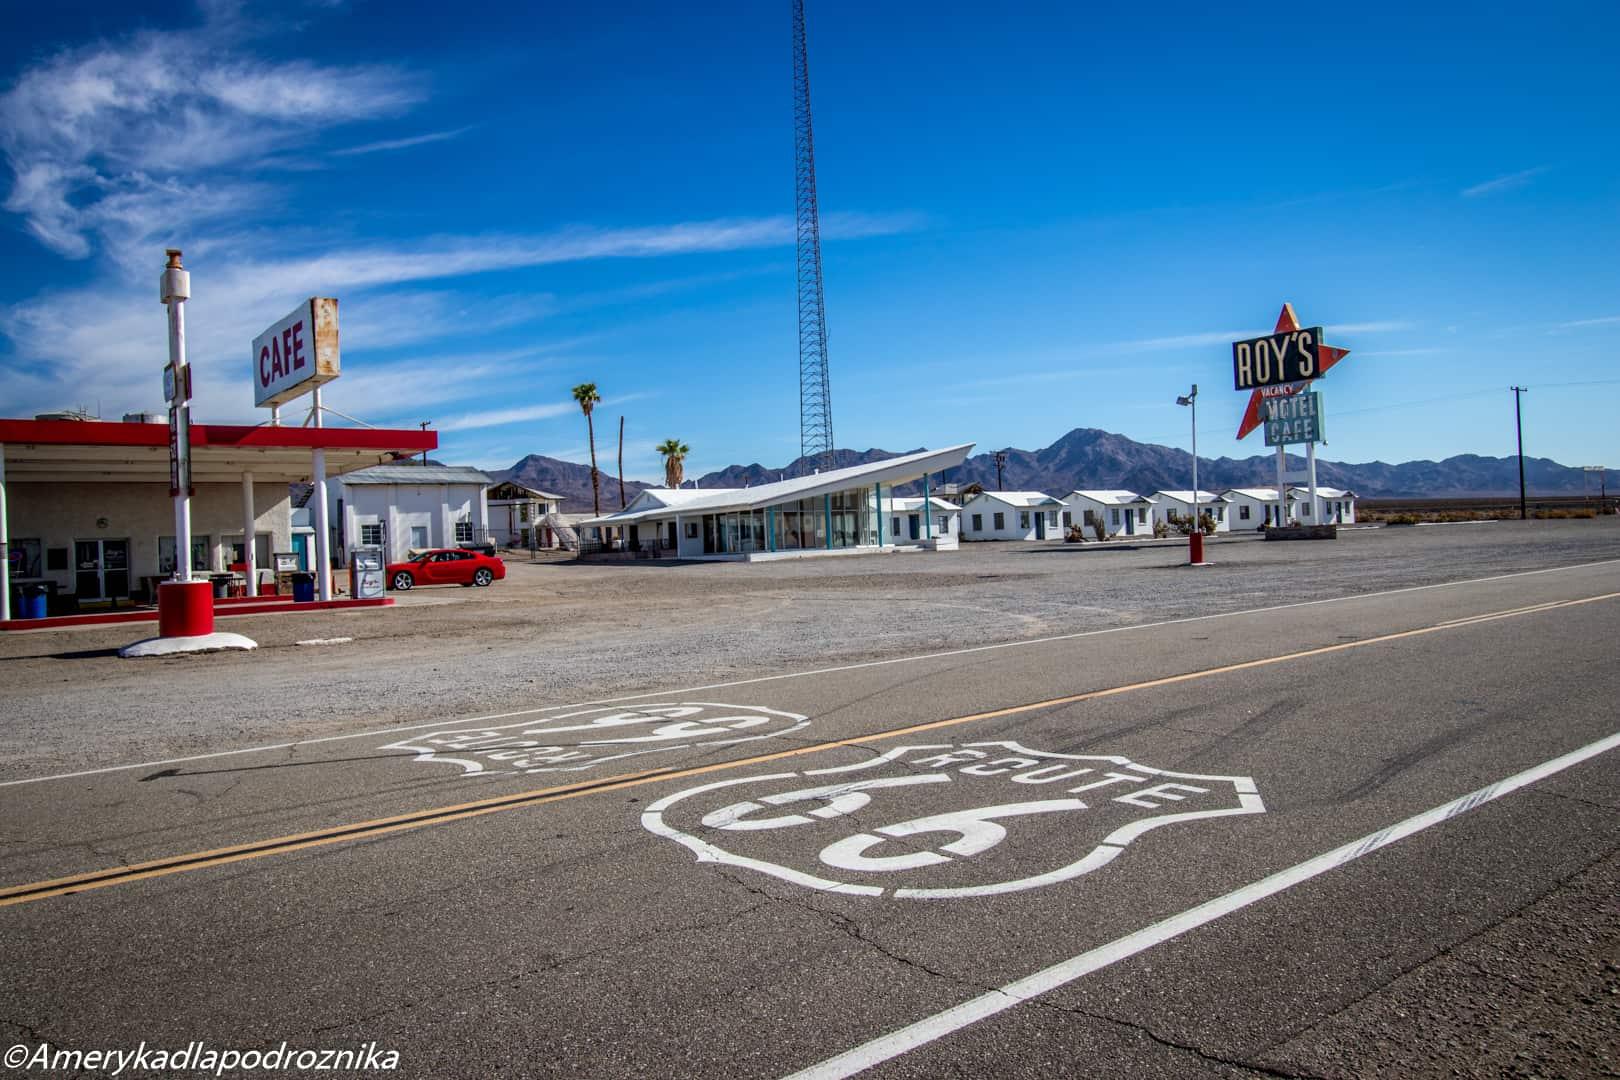 droga 66 - Roy's motel